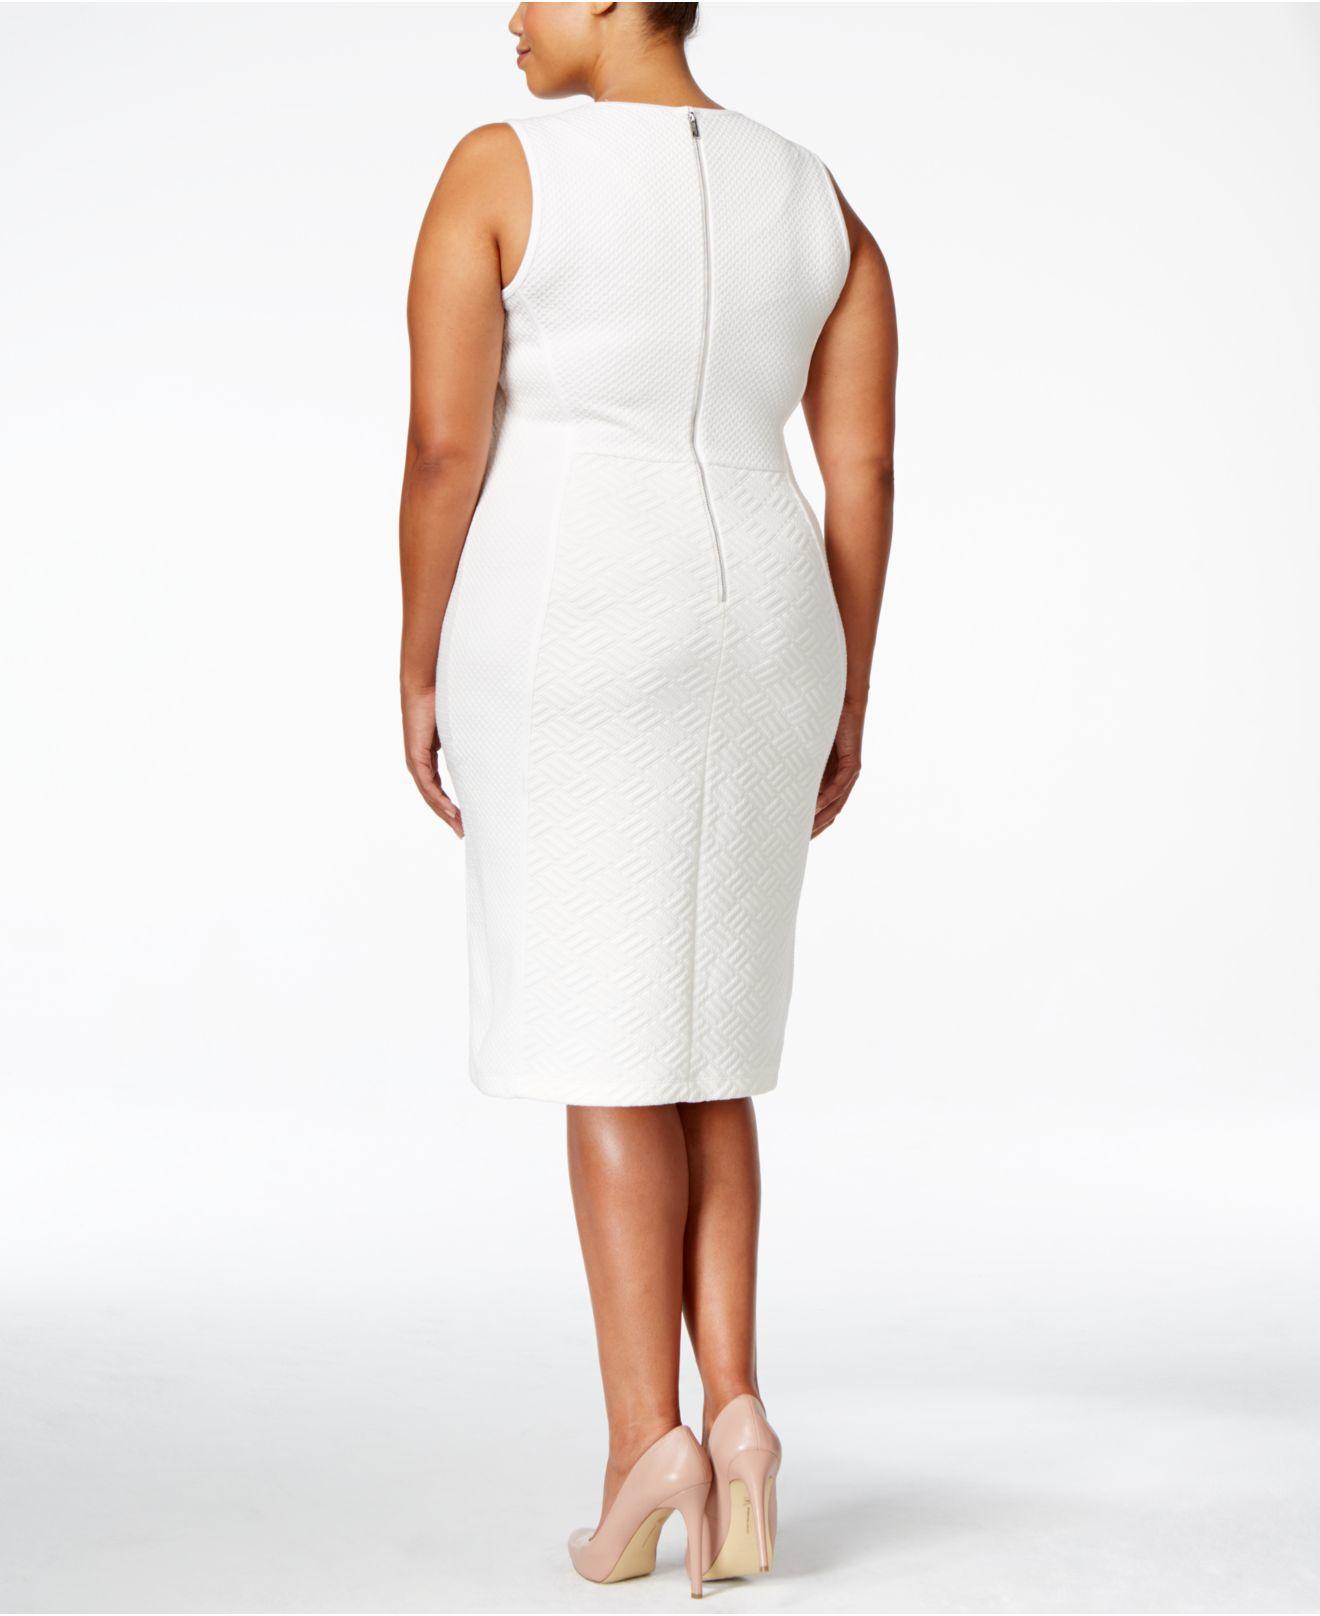 0474d911 Calvin Klein Plus Size Sleeveless Textured-knit Sheath Dress in ...